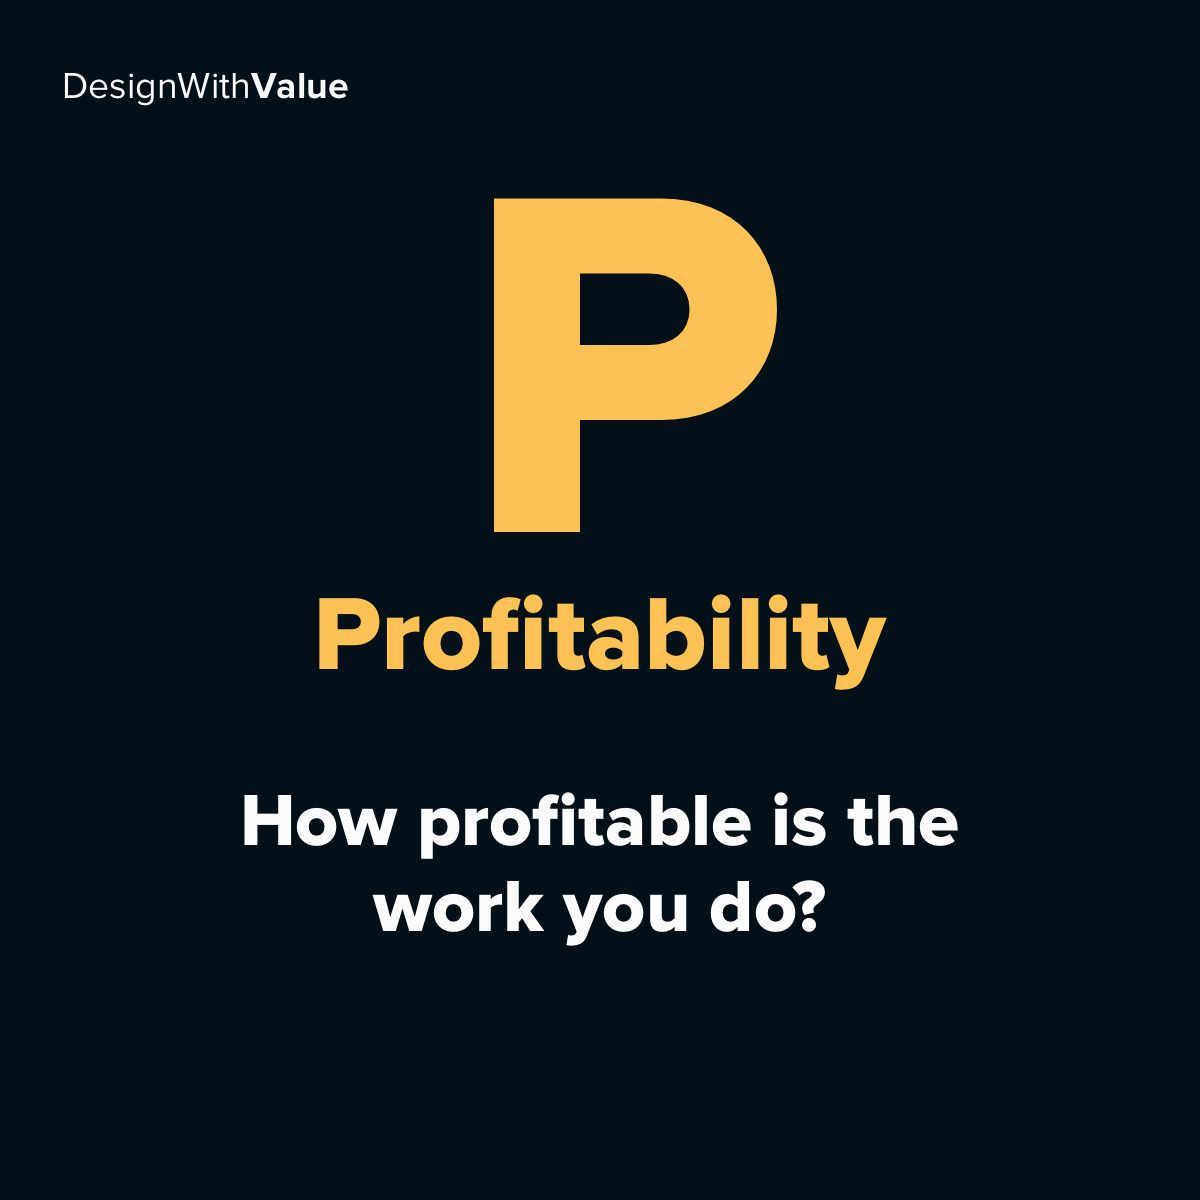 P = Profitability. How profitable is the work you do?